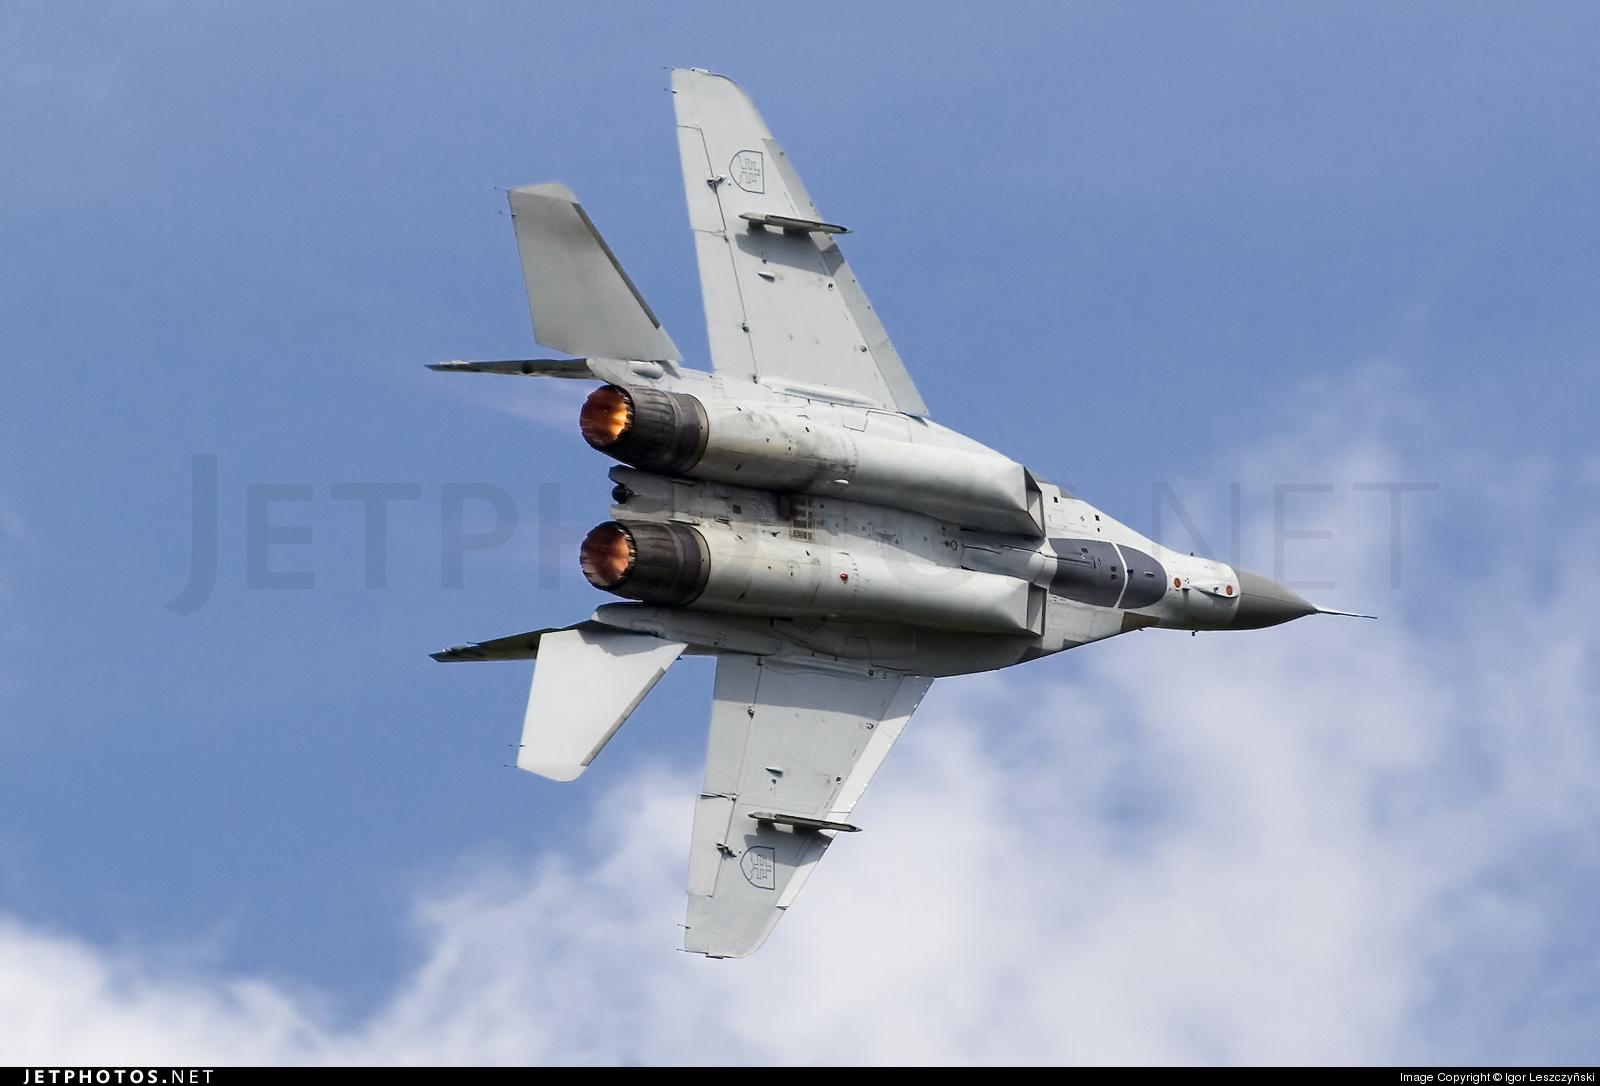 0619 - Mikoyan-Gurevich MiG-29AS Fulcrum - Slovakia - Air Force